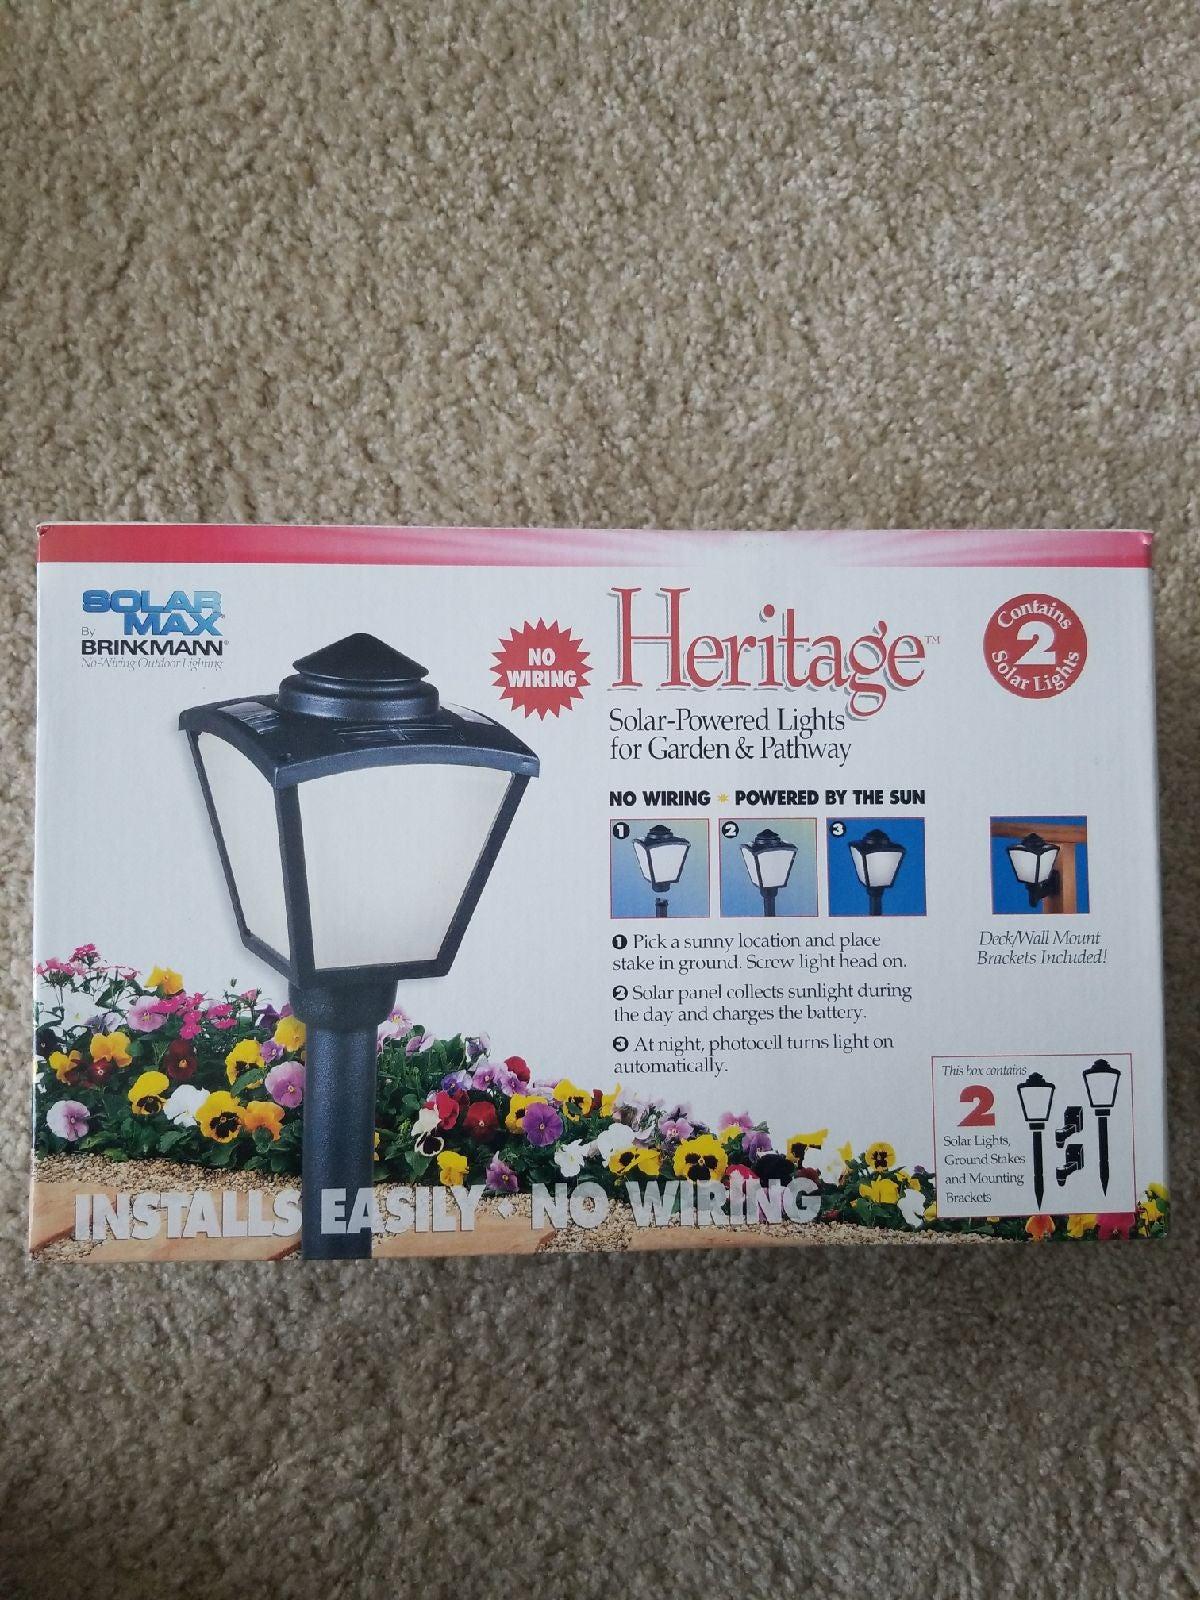 Heritage solar powered lights